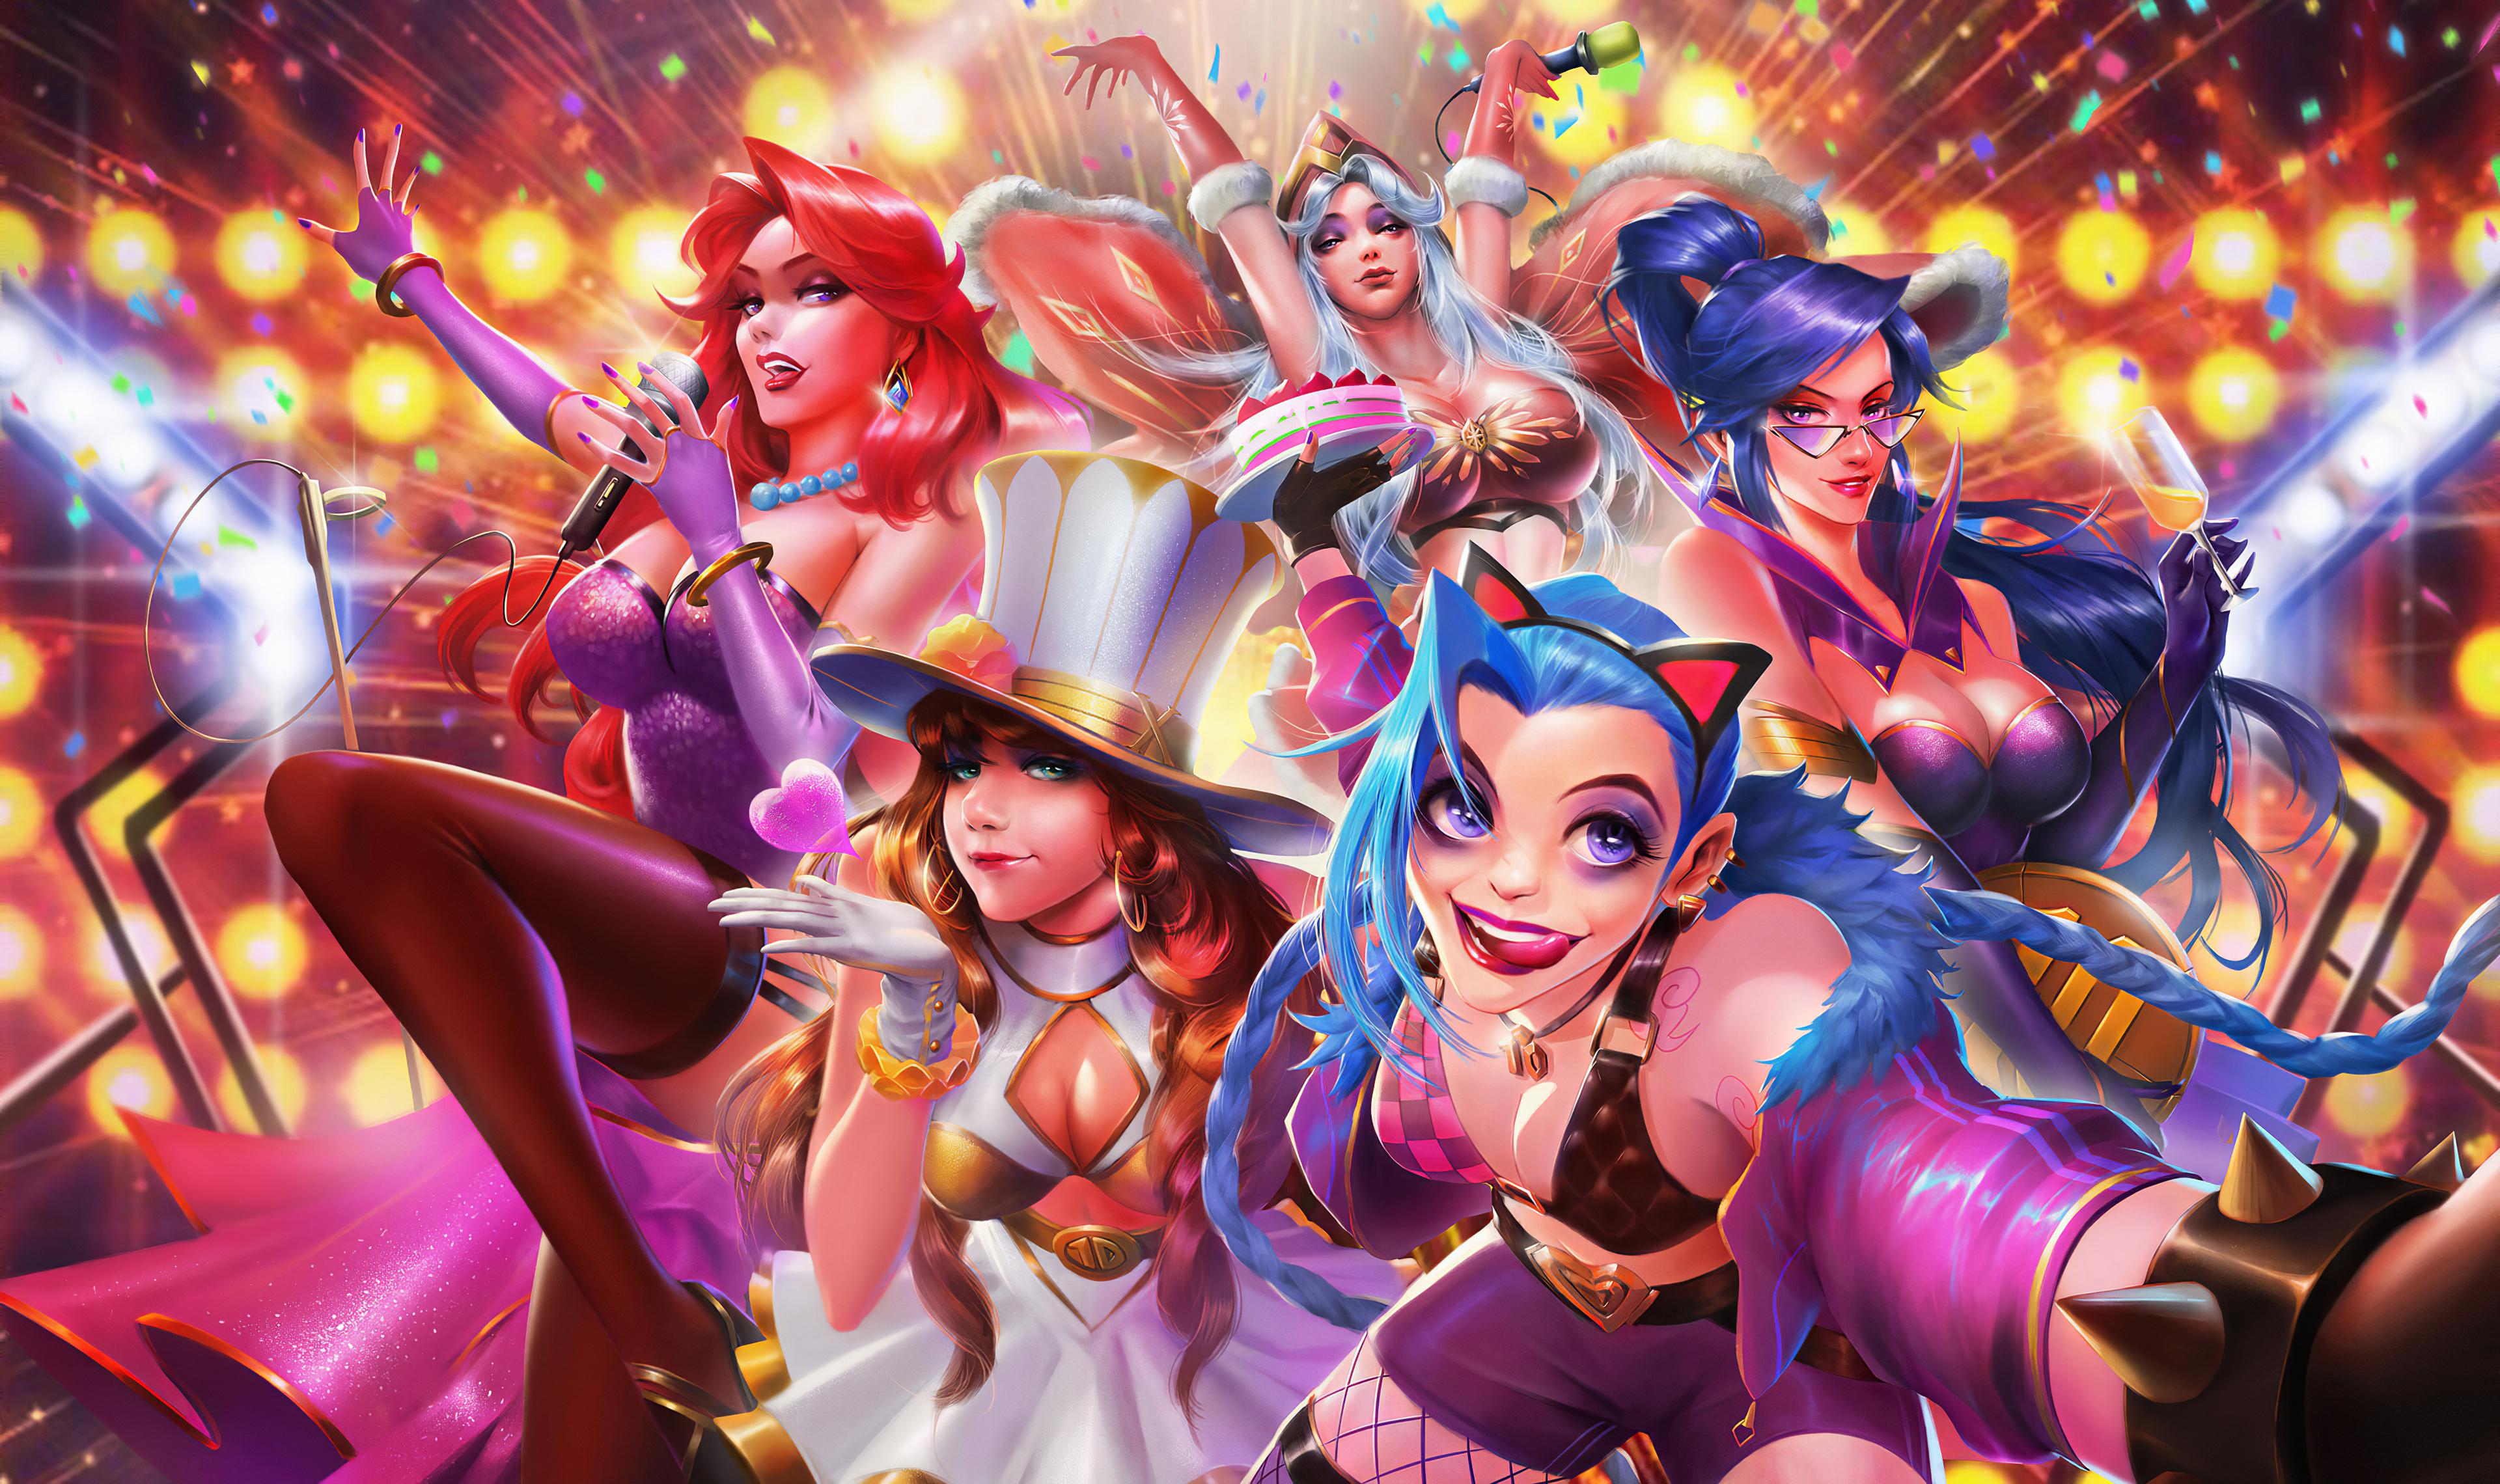 League Of Legends 2020 4k, HD Games, 4k Wallpapers, Images ...